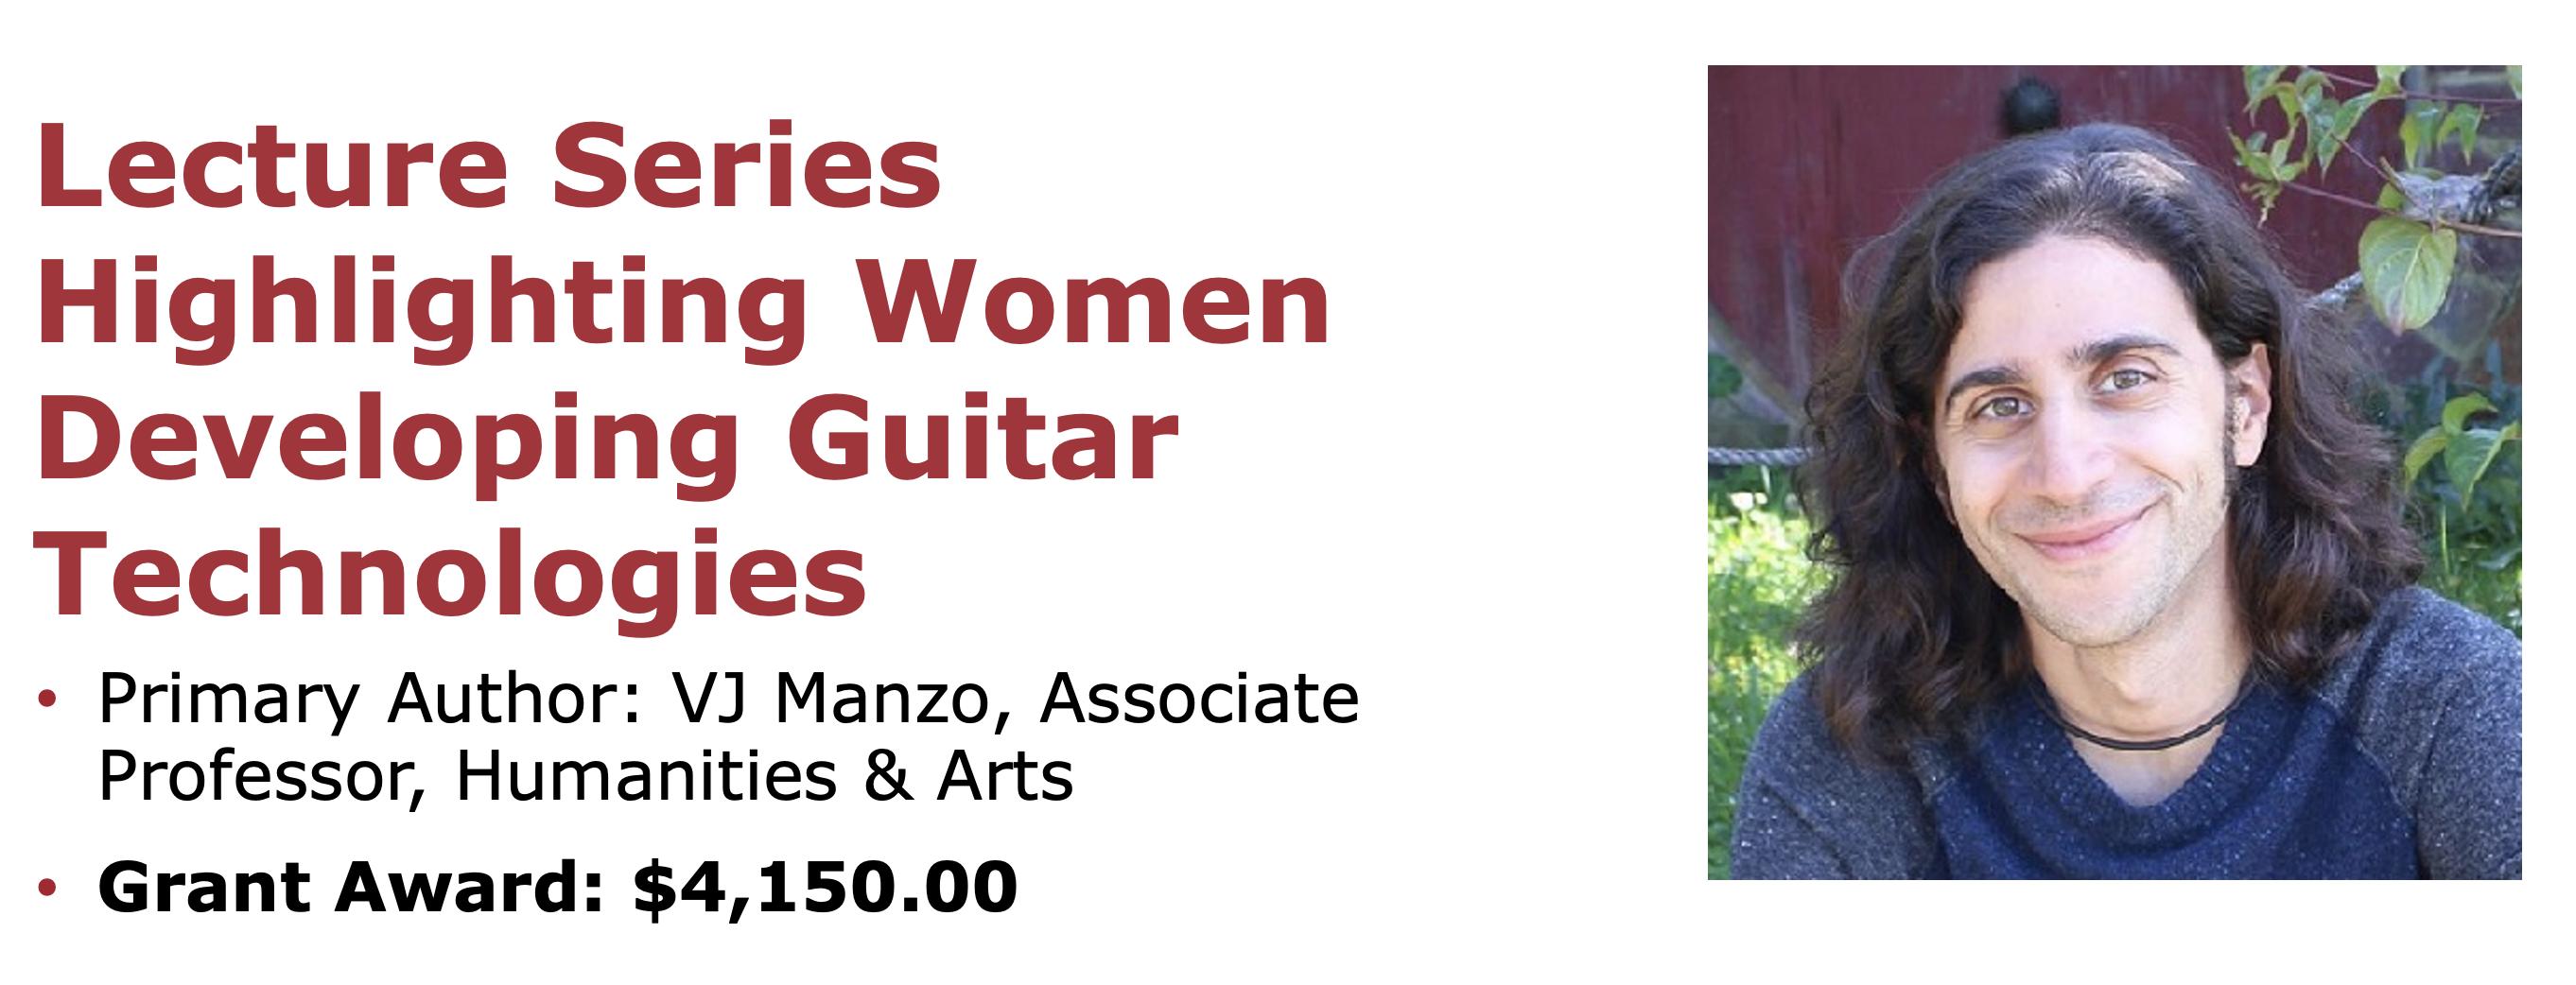 Lecture Series Highlighting Women Developing Guitar Technologies